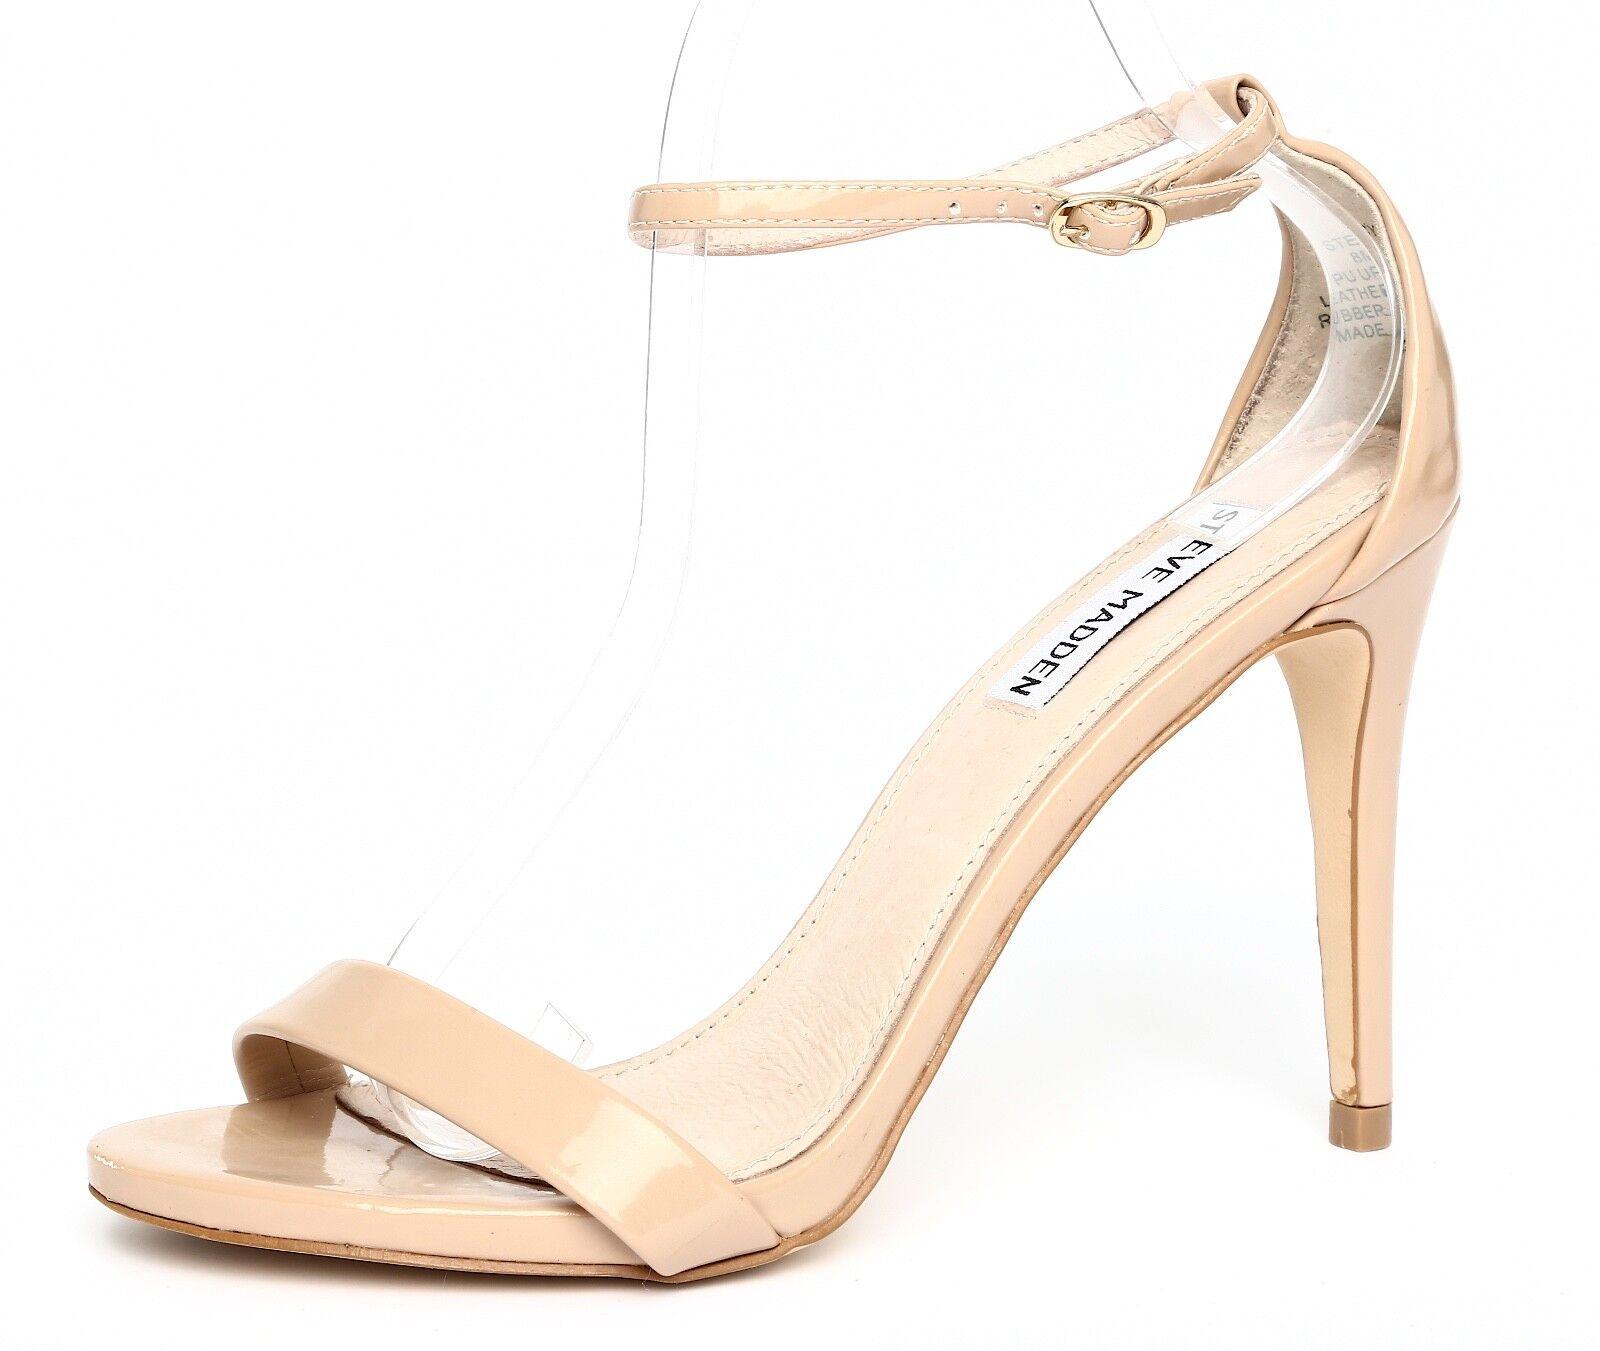 Steve Madden Stecy Patent Pelle Nude Ankle Strap Sandal Heels Sz 8M 4121